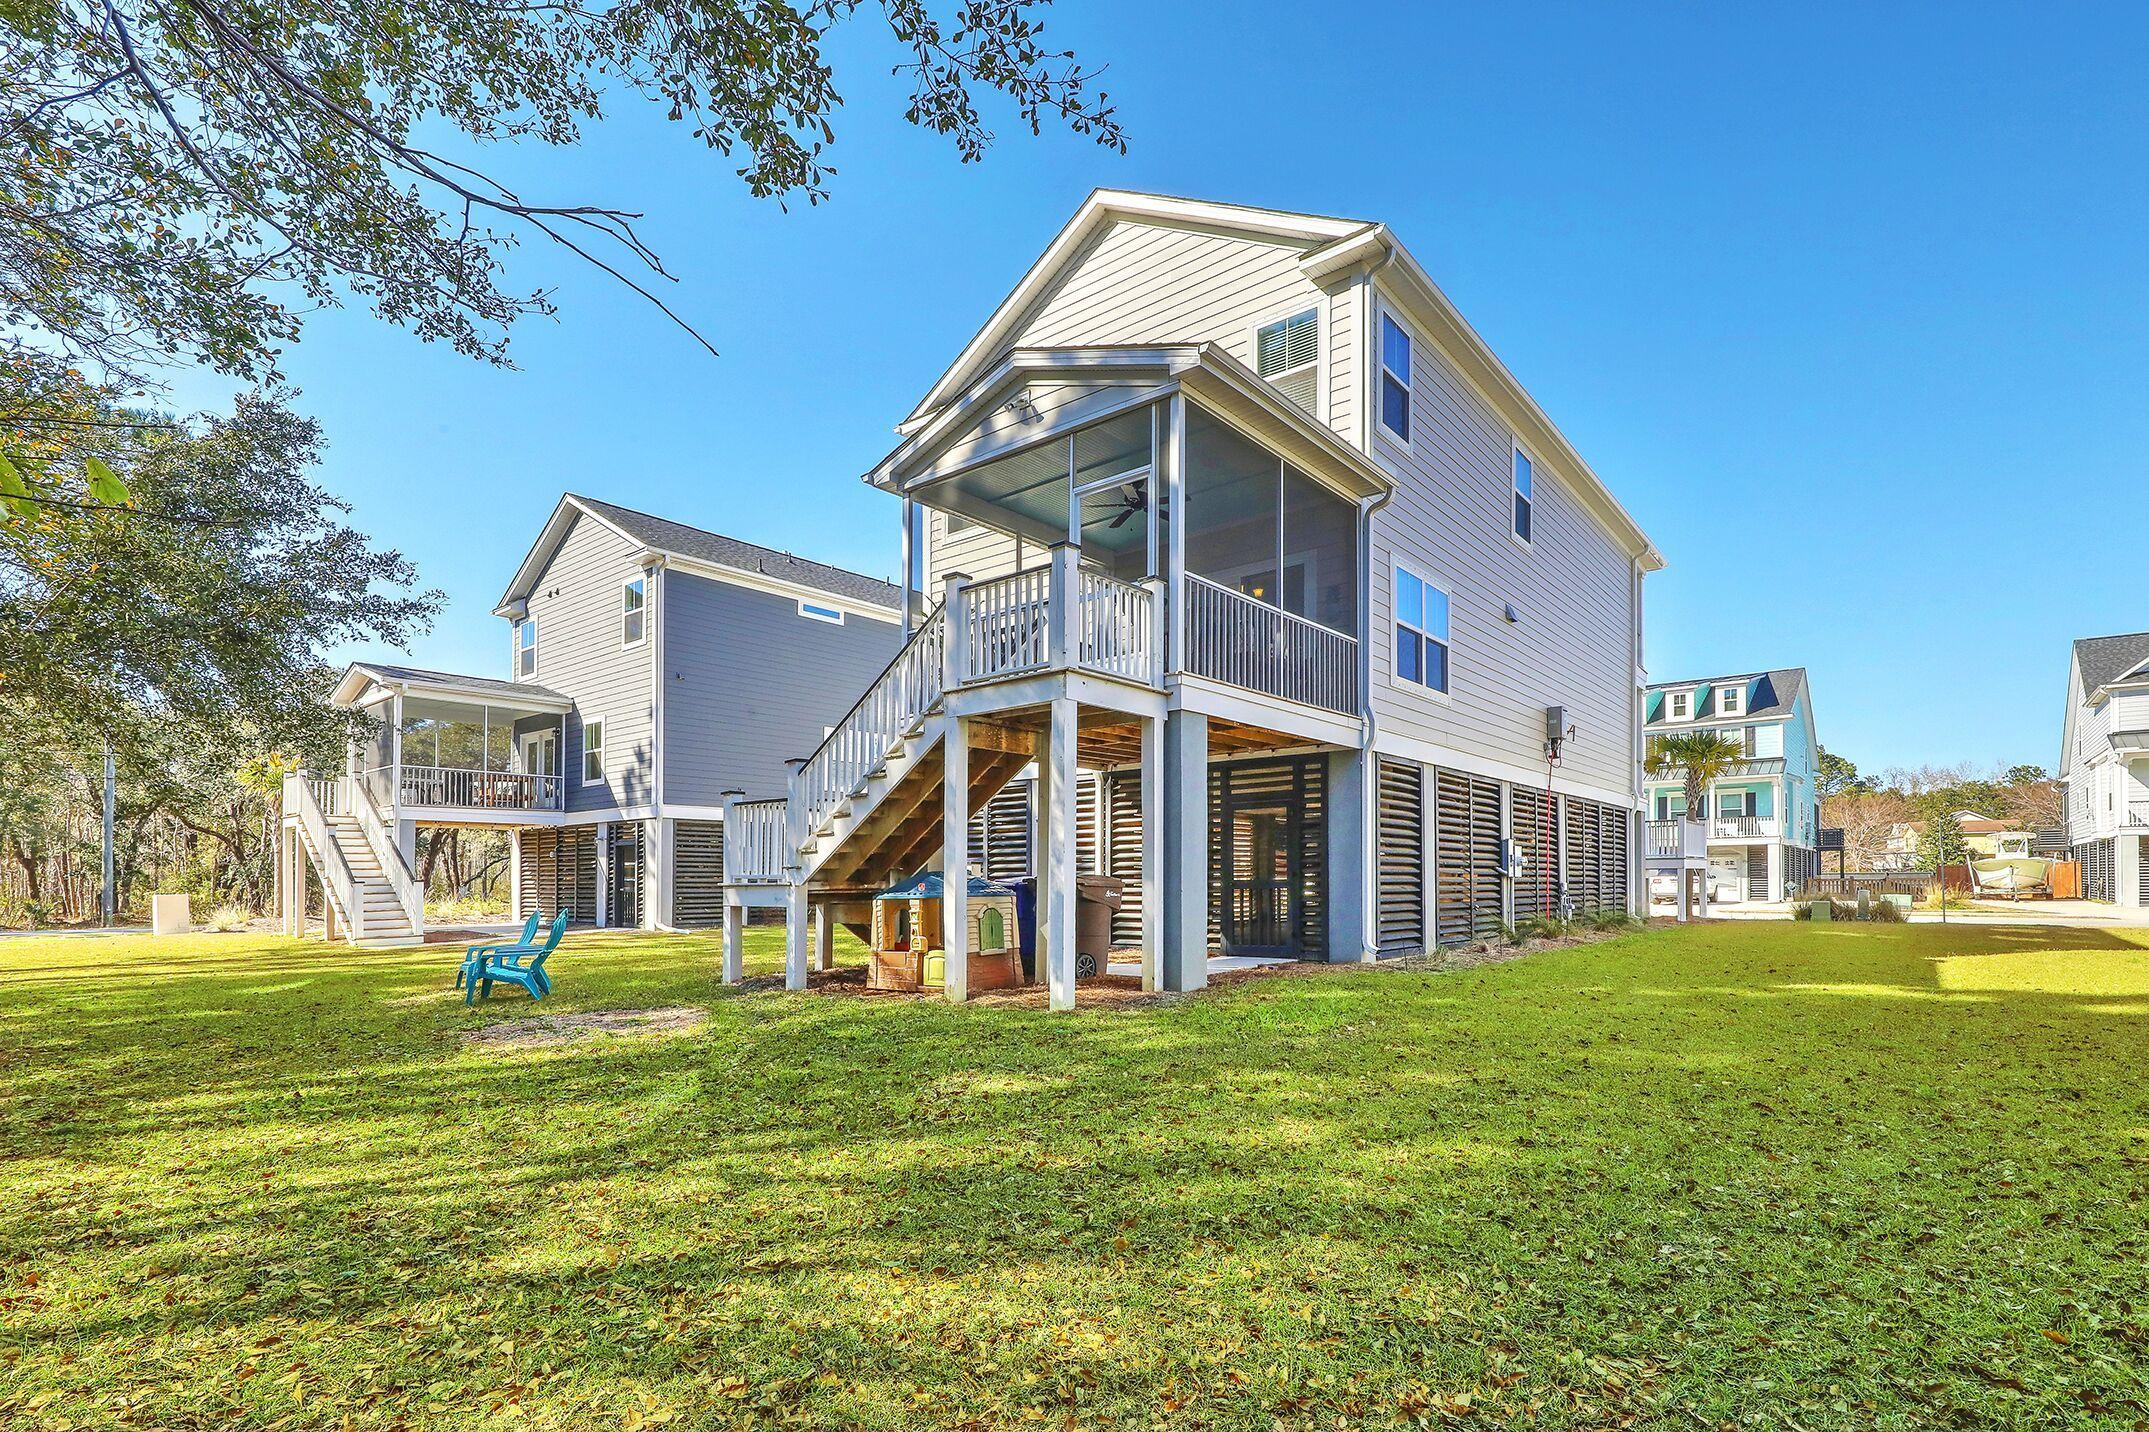 Copahee Landing Homes For Sale - 3731 Copahee Sound, Mount Pleasant, SC - 3